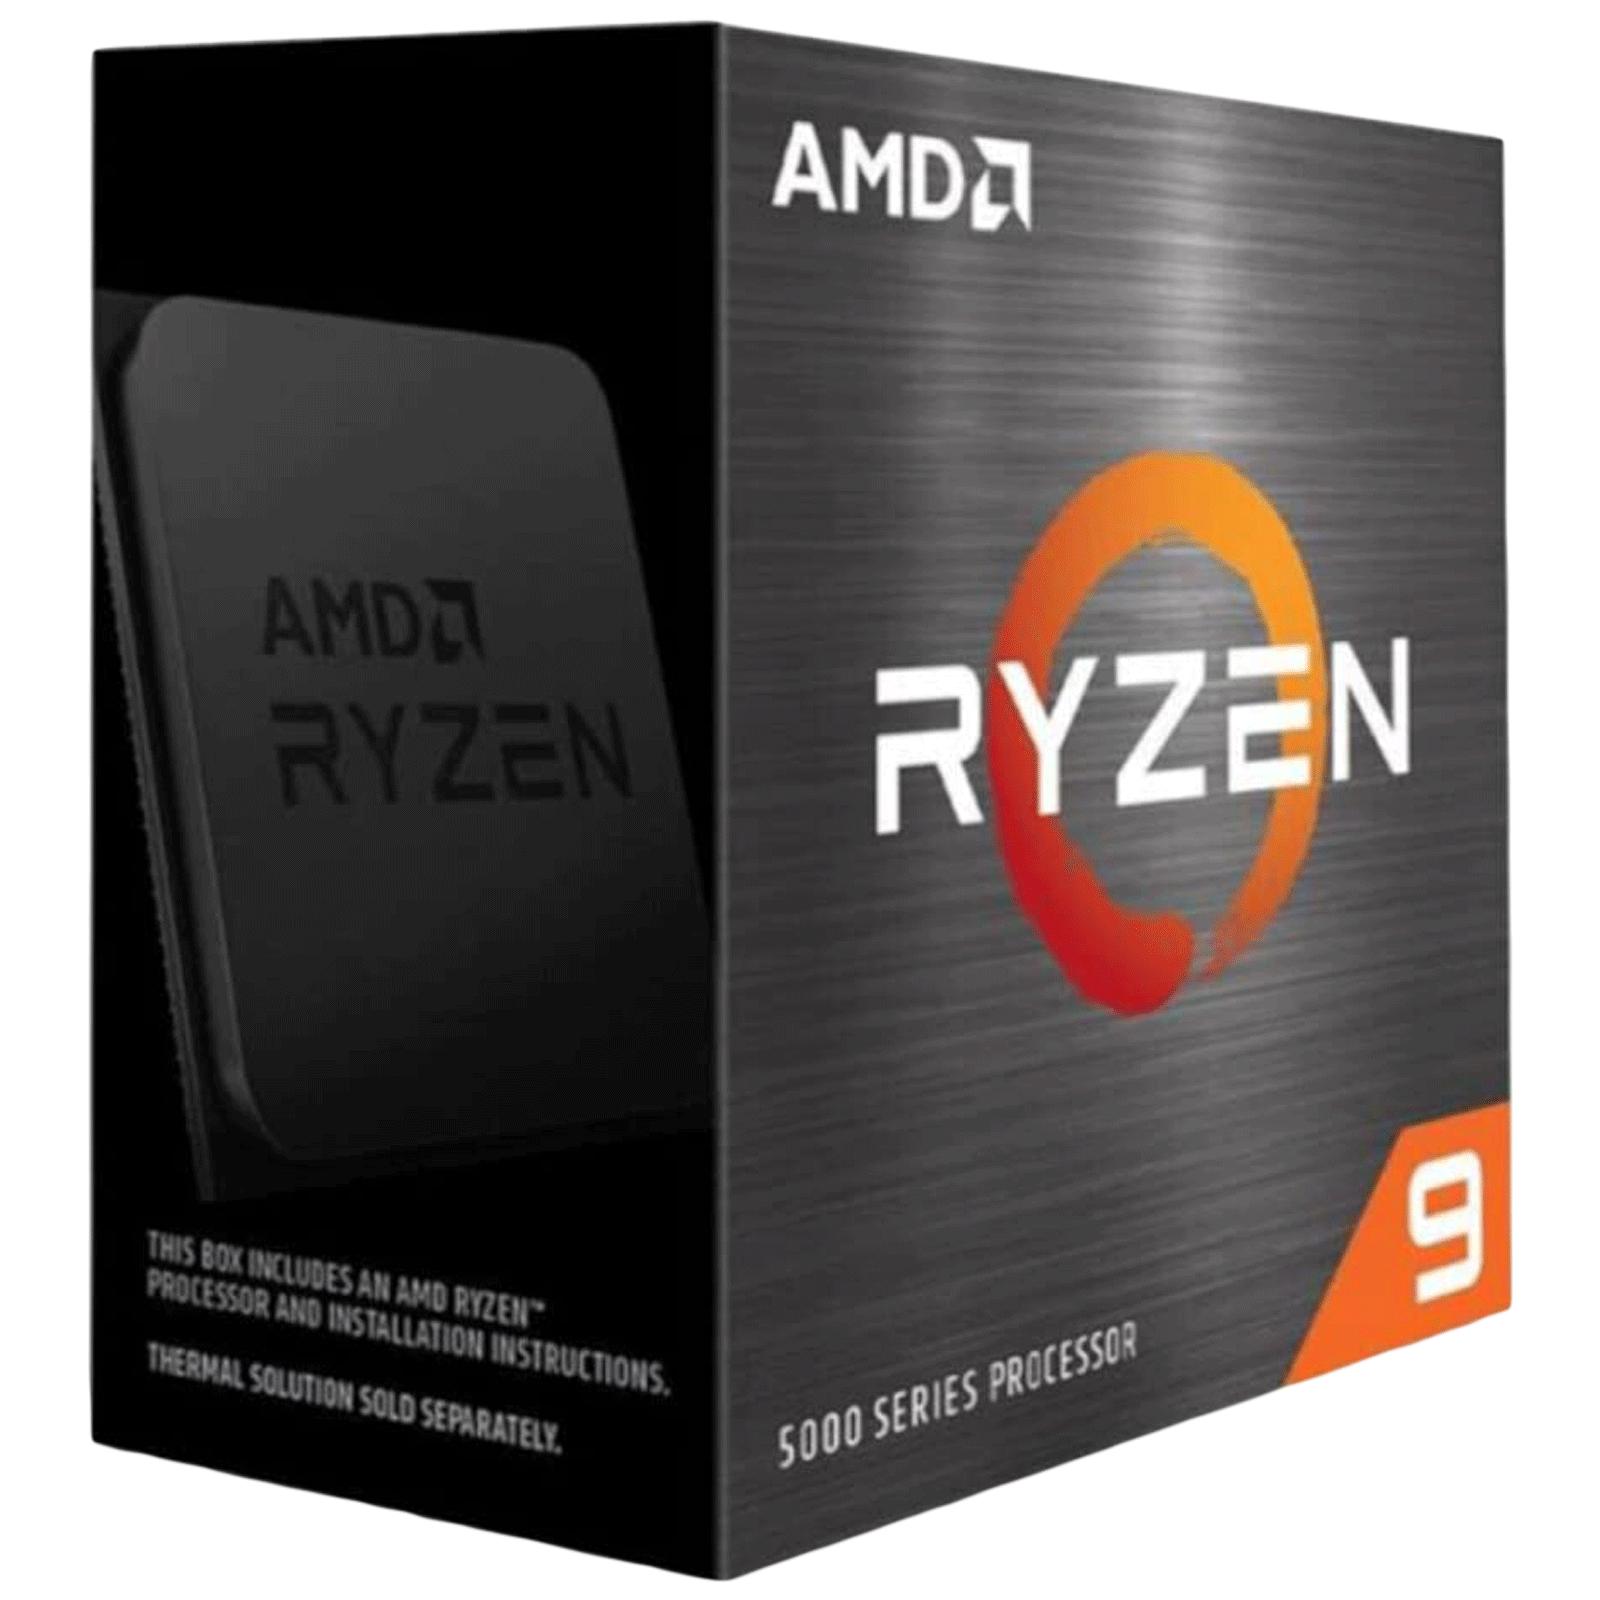 AMD Ryzen 9 Desktop Processor (12 Cores, 3.4 GHz, AMD StoreMI Technology, 5900X, Silver)_1